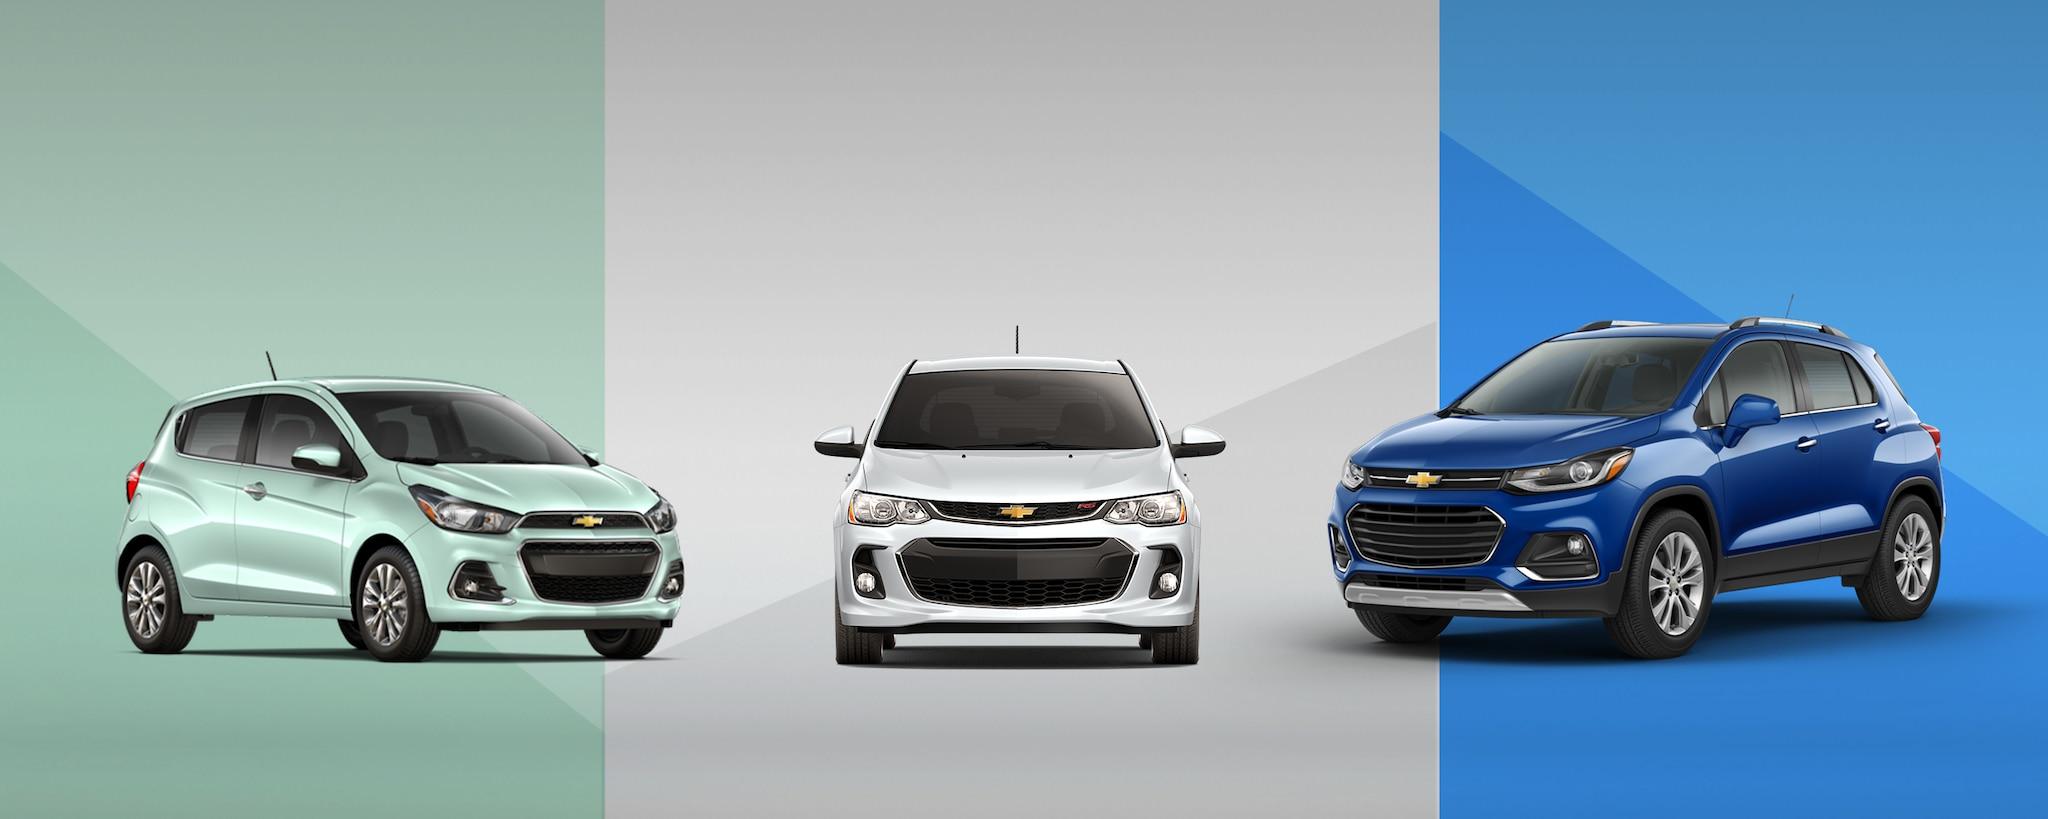 Autos compactos Chevrolet